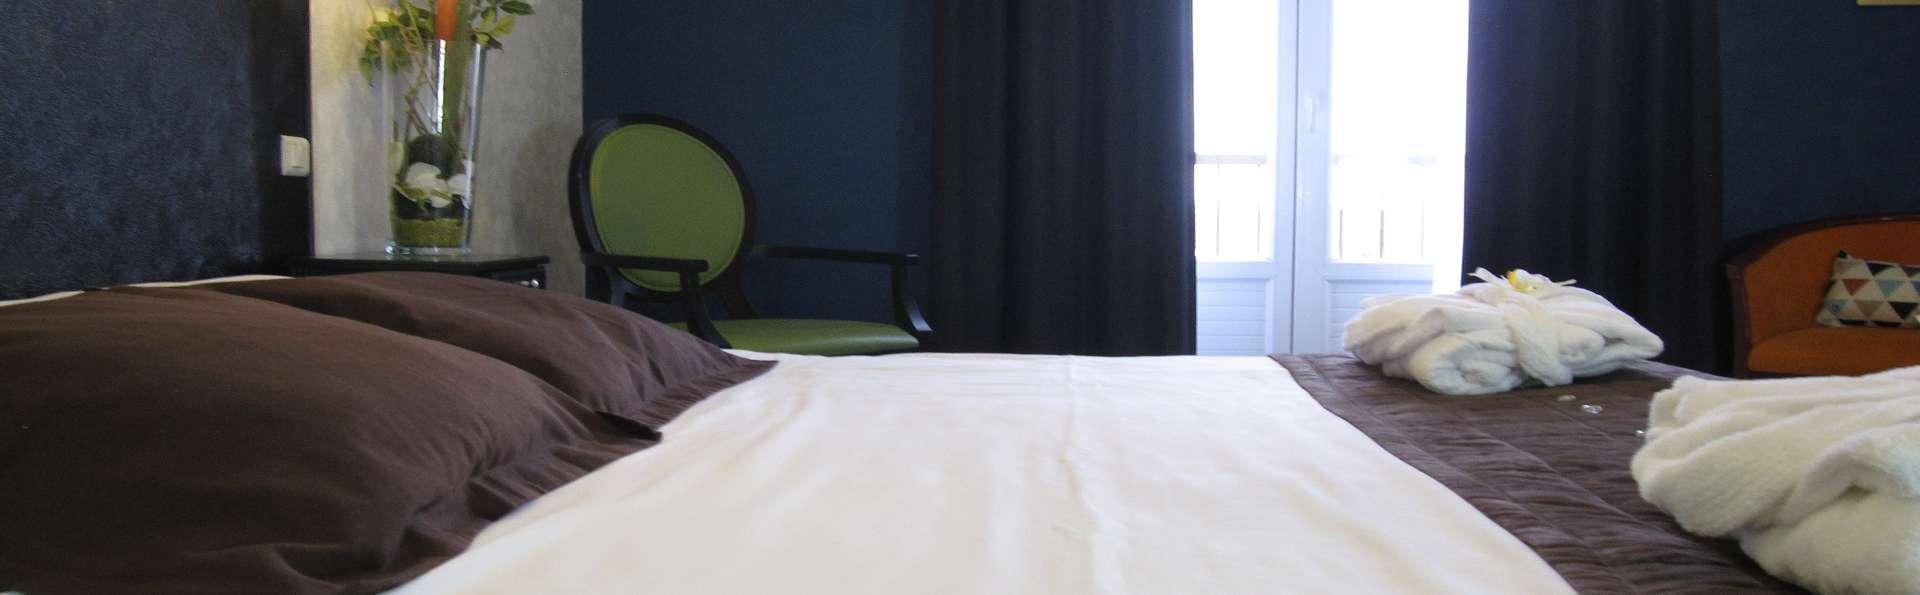 Hôtel Club Cosmos - EDIT_Chambre_1.JPG